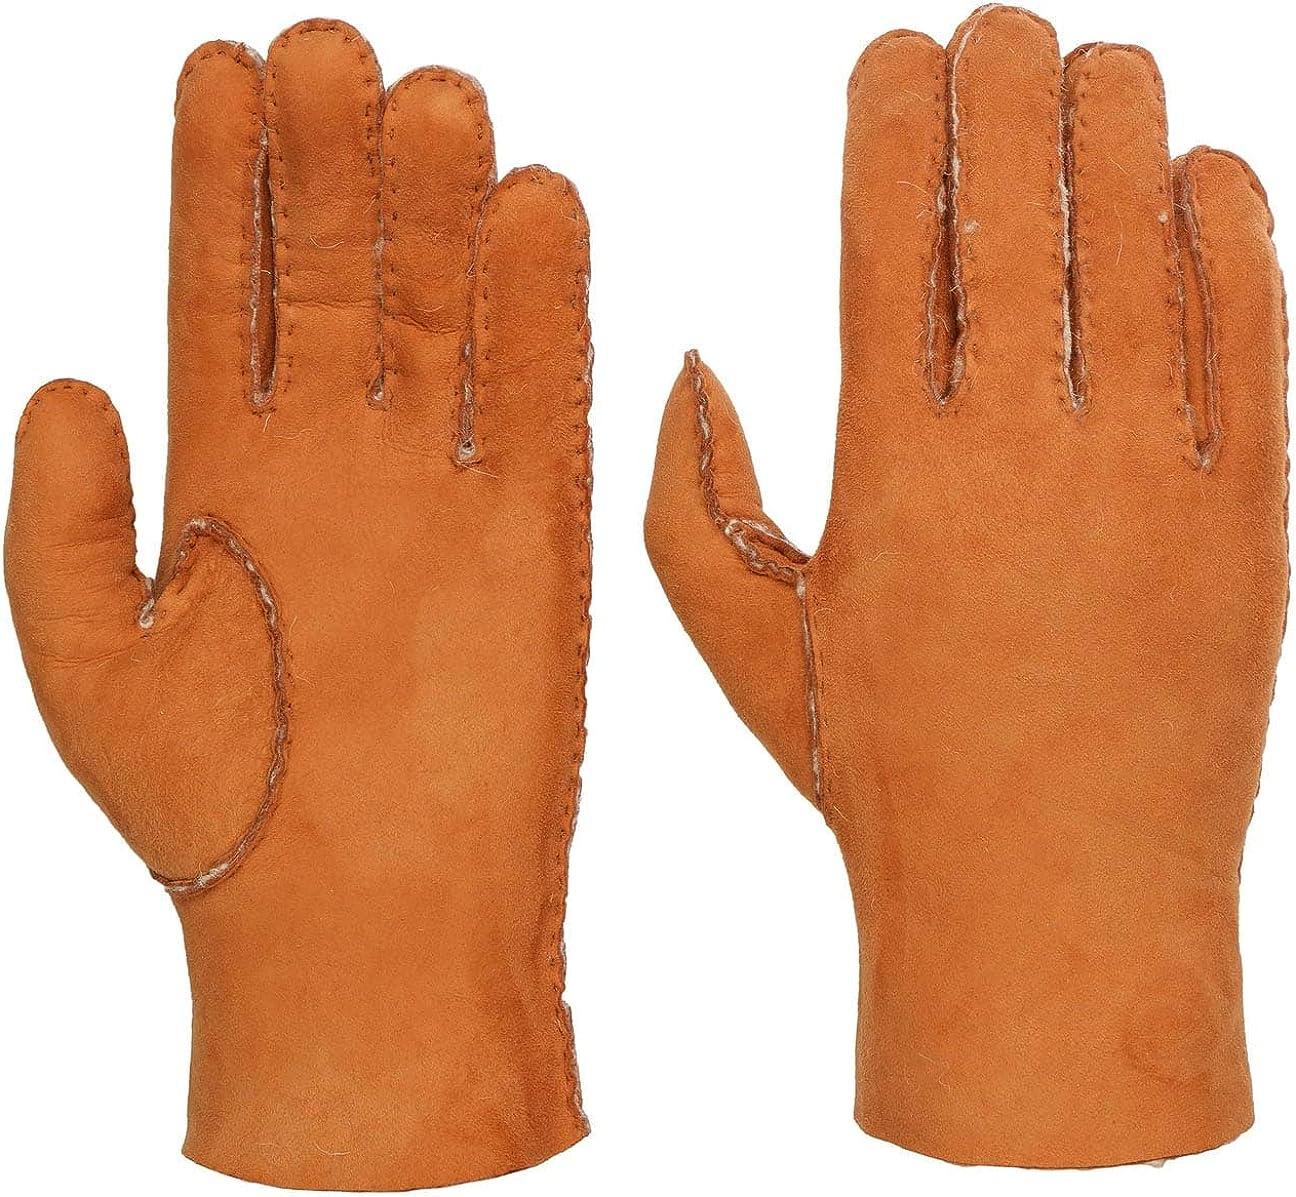 Caridei Lambskin Women´s Gloves Women - Made in Italy